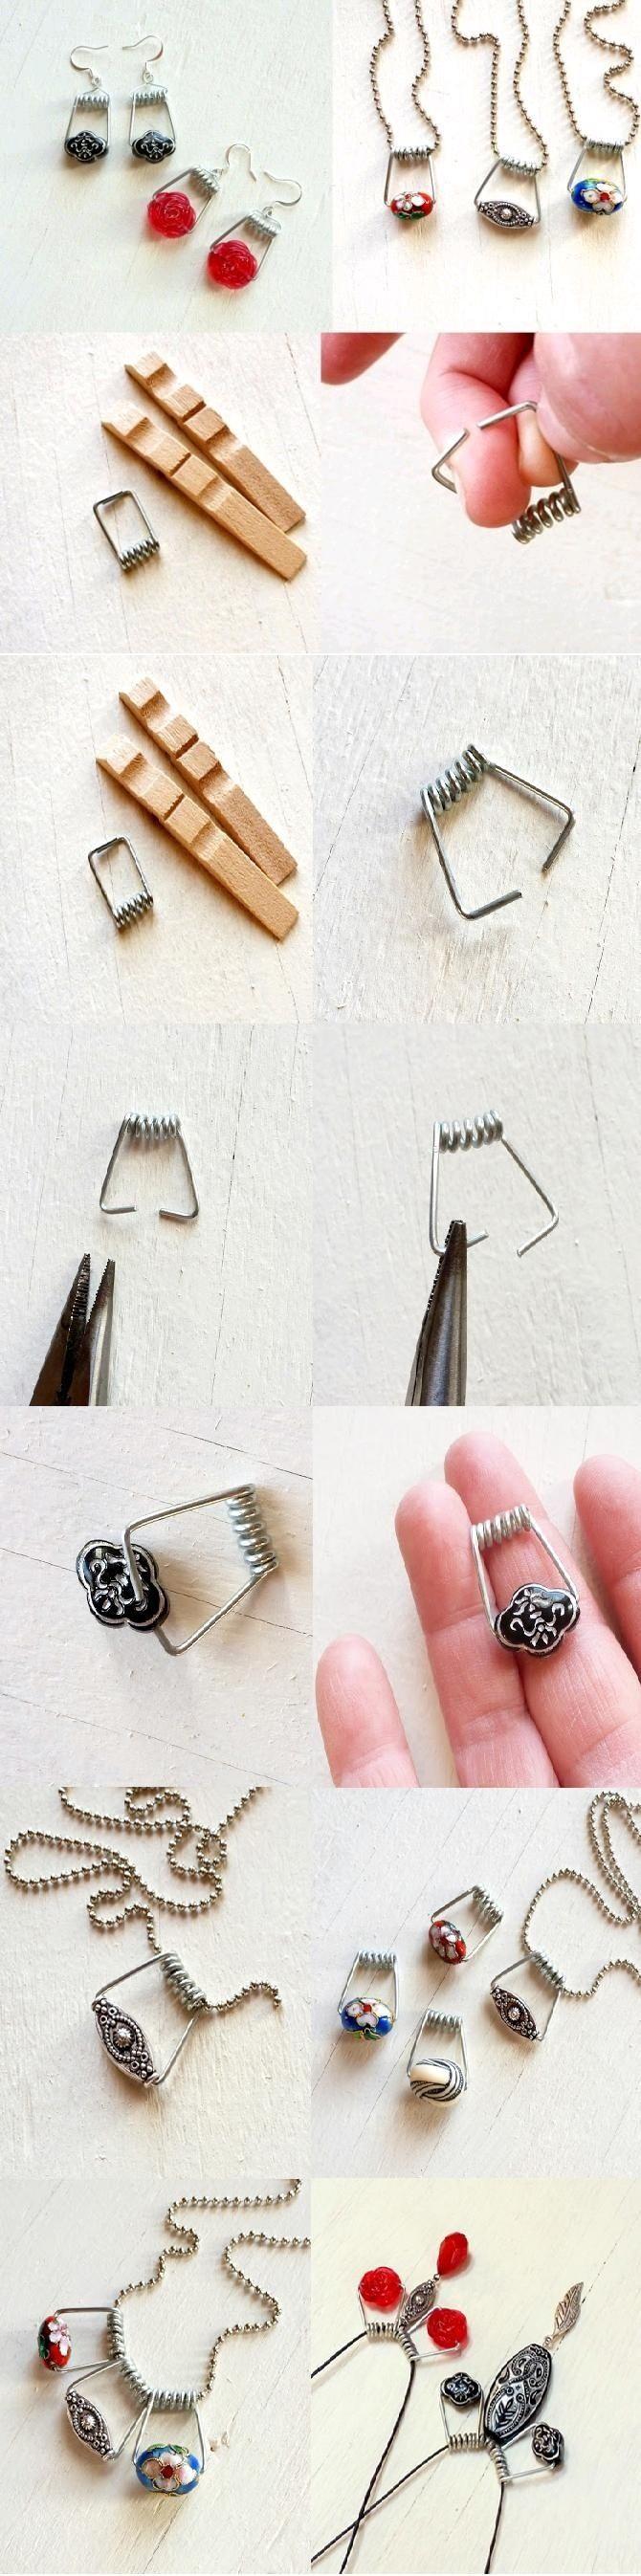 17 Useful and Pretty DIY Ideas for Necklace - Pretty Designs